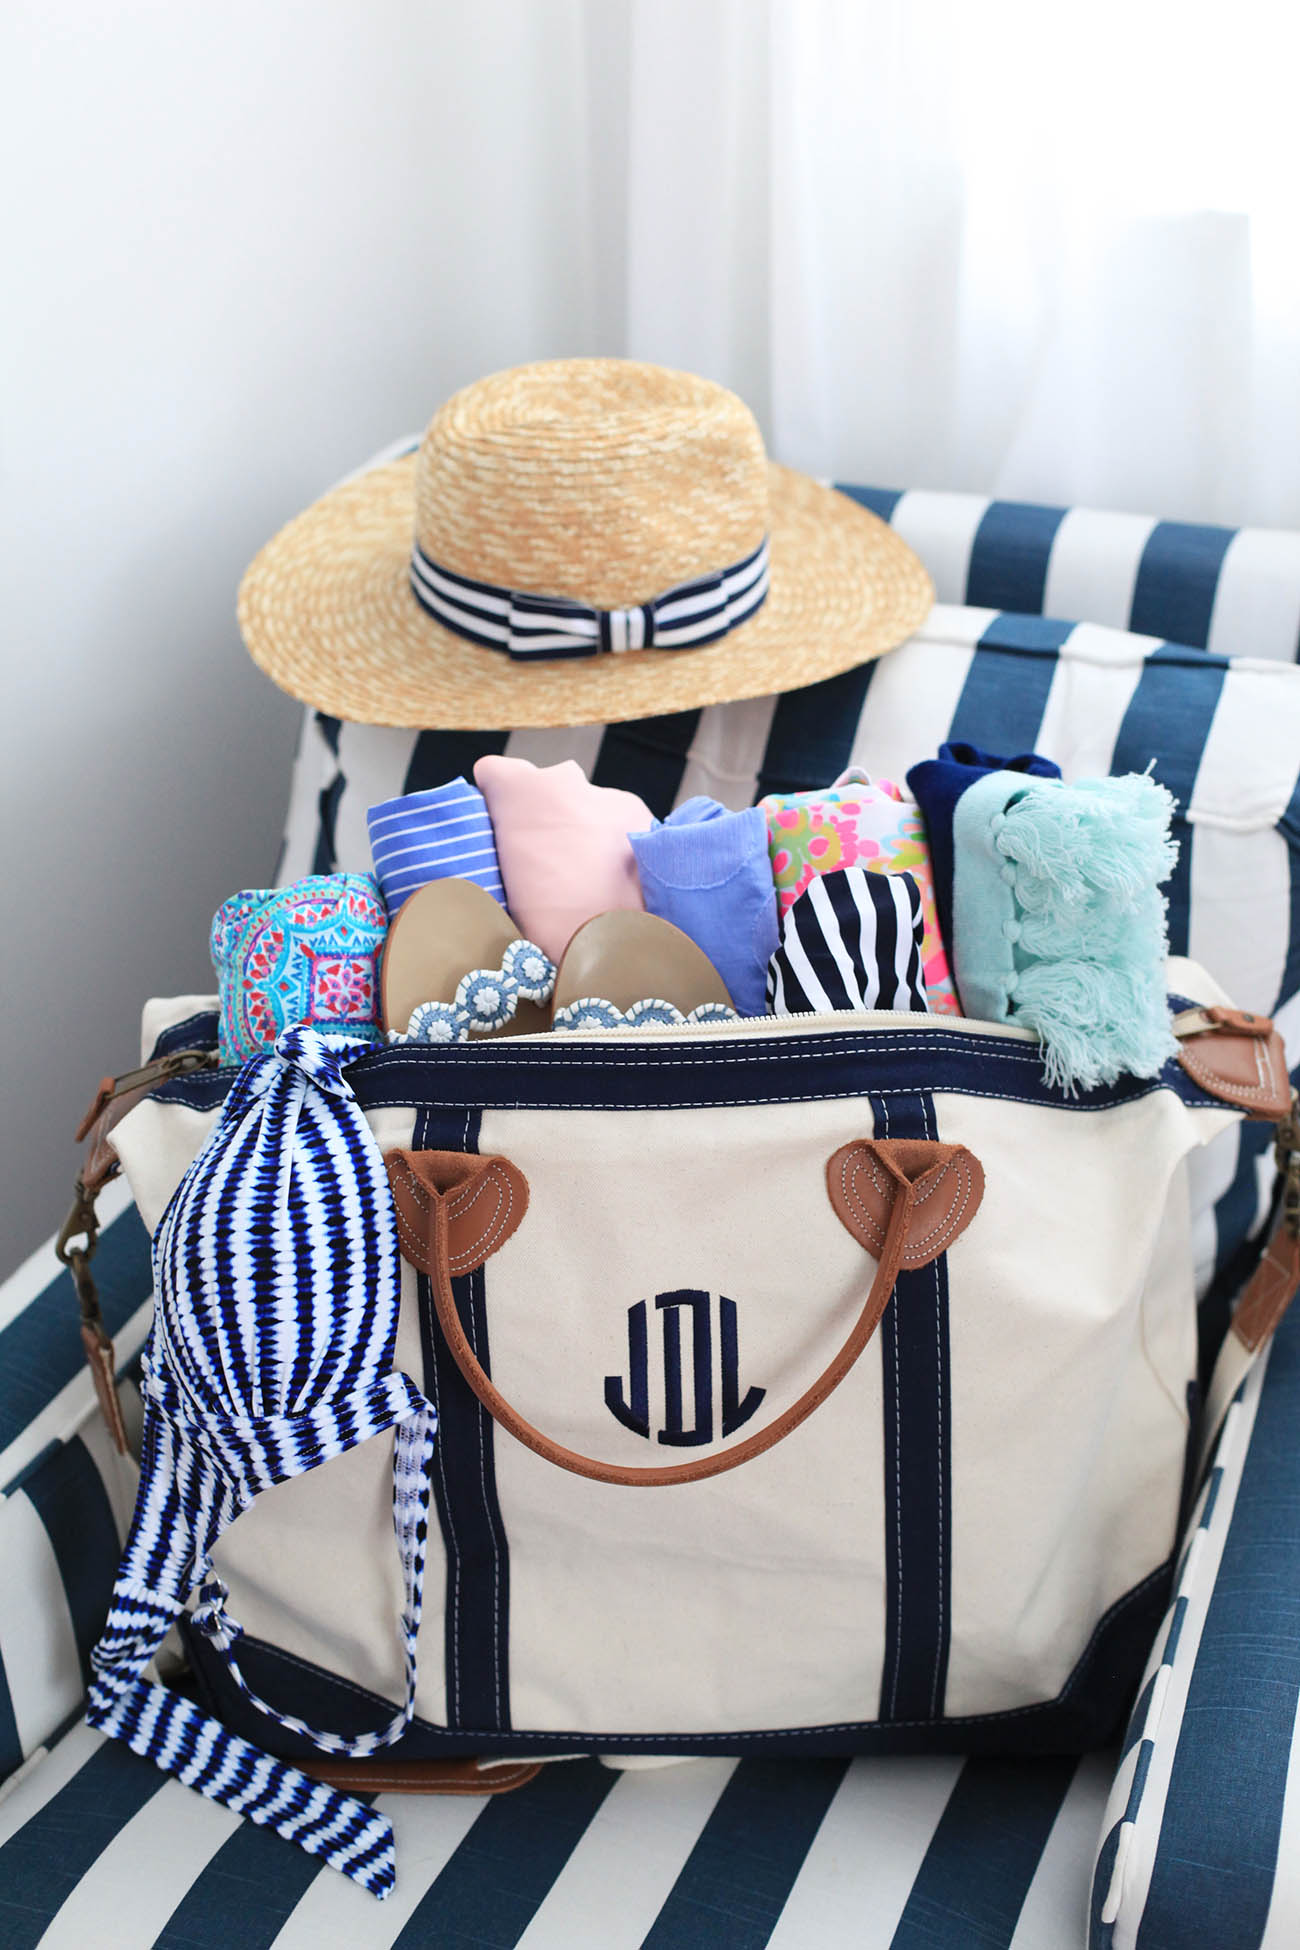 Sarasota Packing List